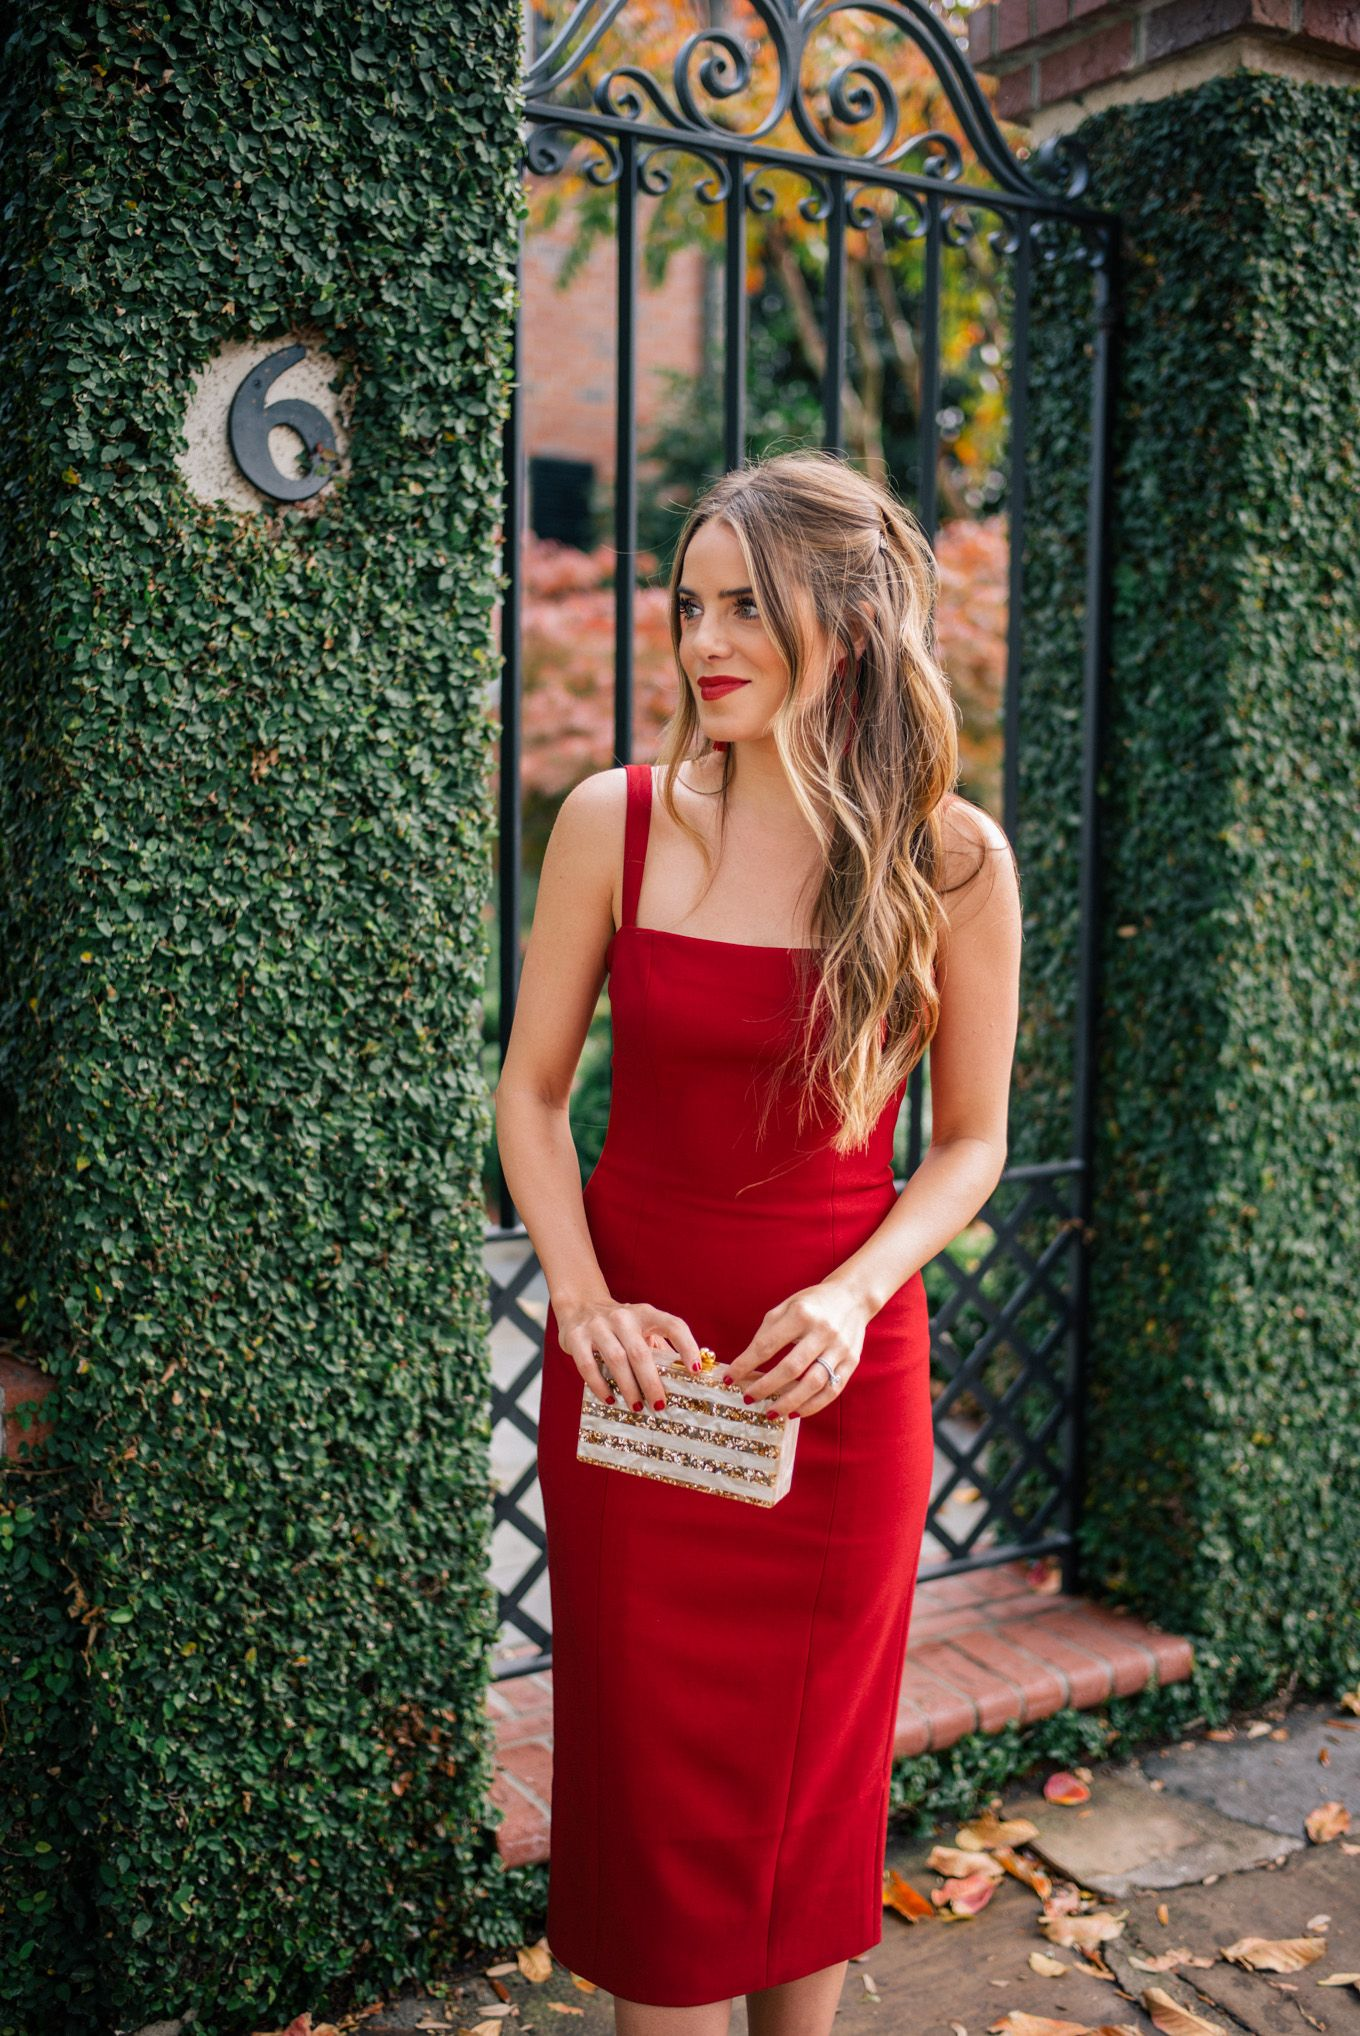 red dress by alice munro pdf